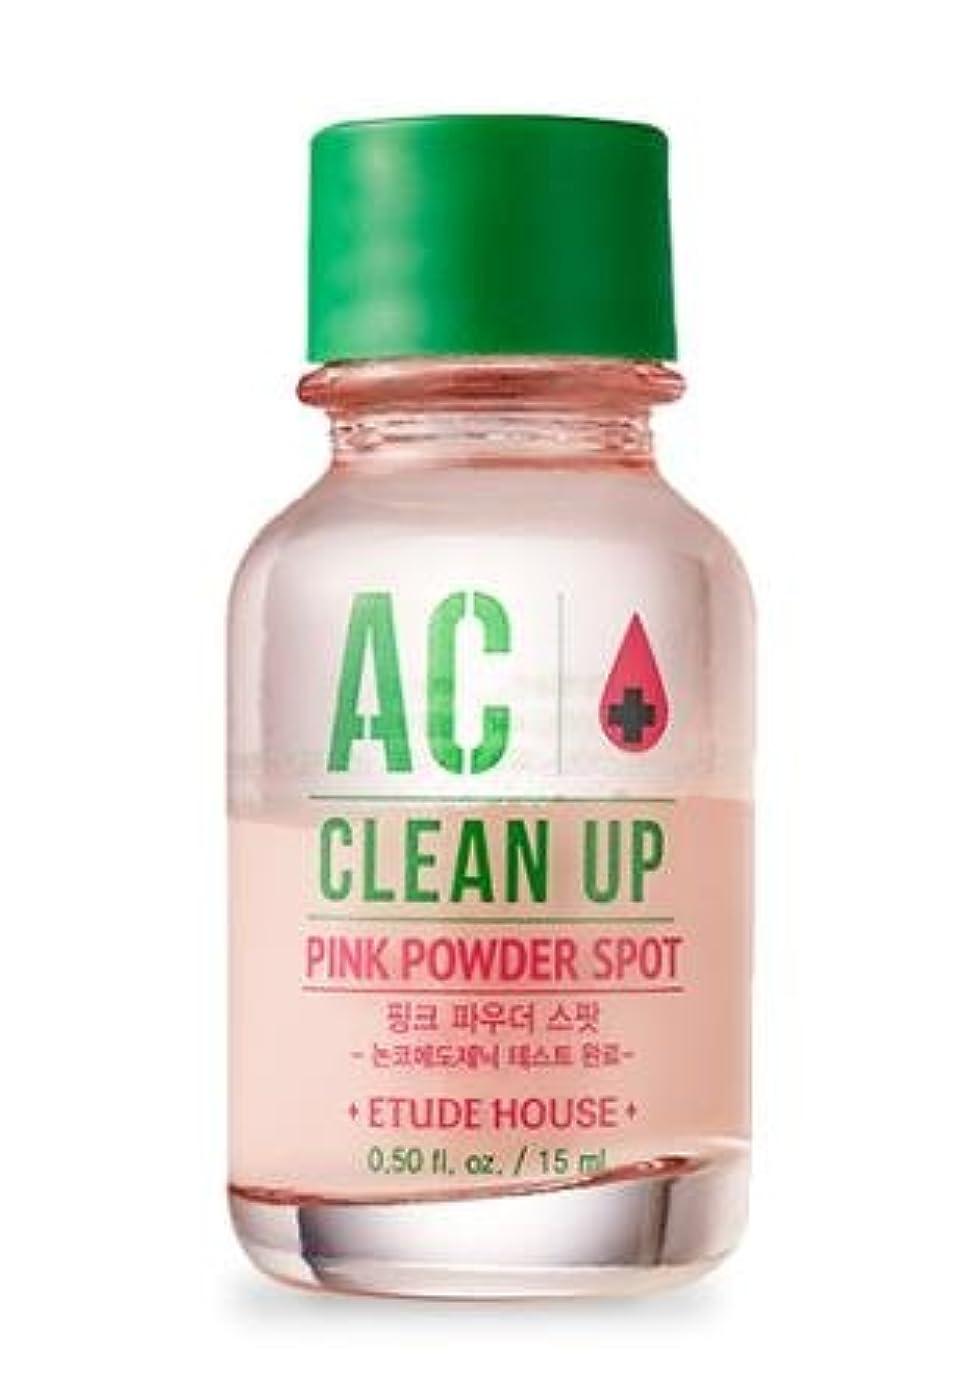 ETUDE HOUSE AC Clean Up Pink Powder Spot 15ml エチュードハウスACクリーンアップピンクパウダースポット [並行輸入品]